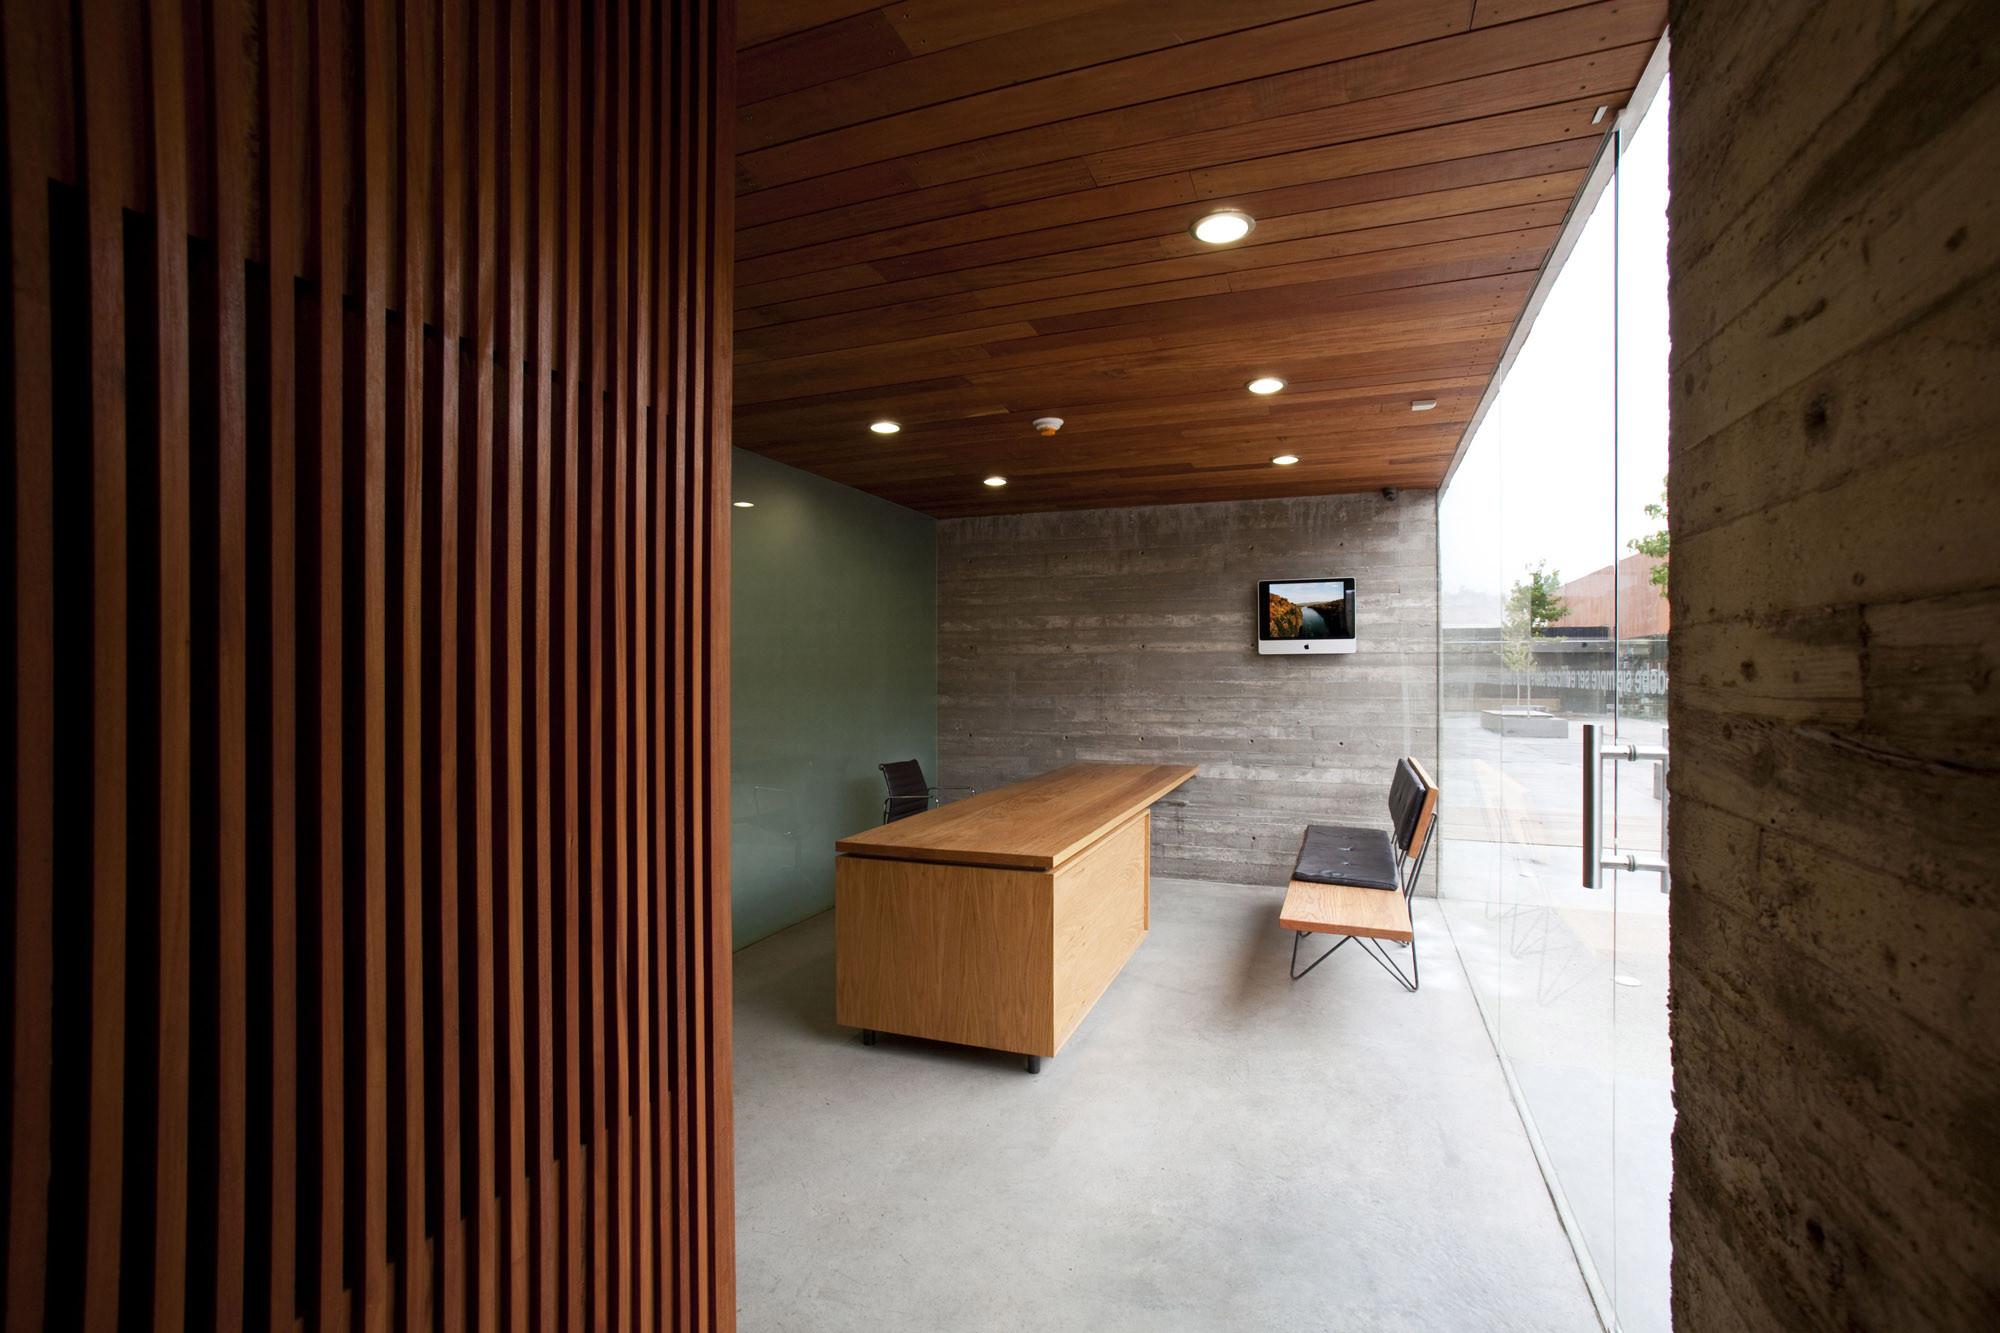 gallery of culinary art school gracia studio 6. Black Bedroom Furniture Sets. Home Design Ideas